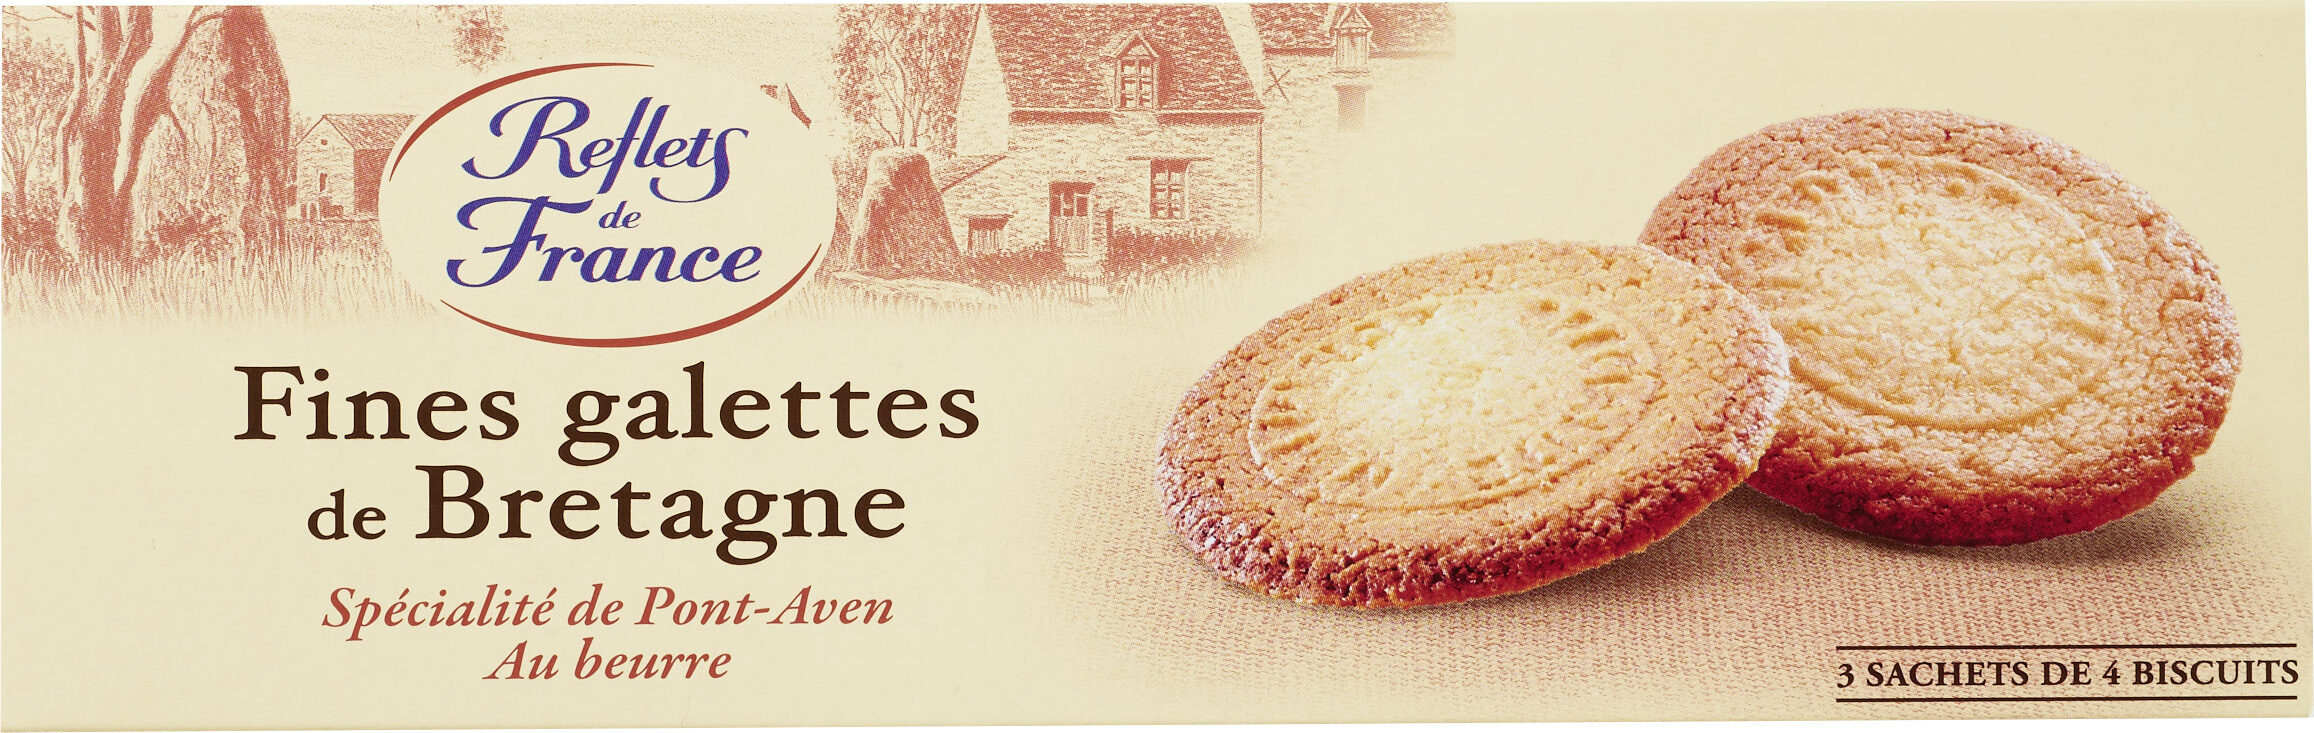 Galette Bretonnes 100g Reflets de France - Produit - fr